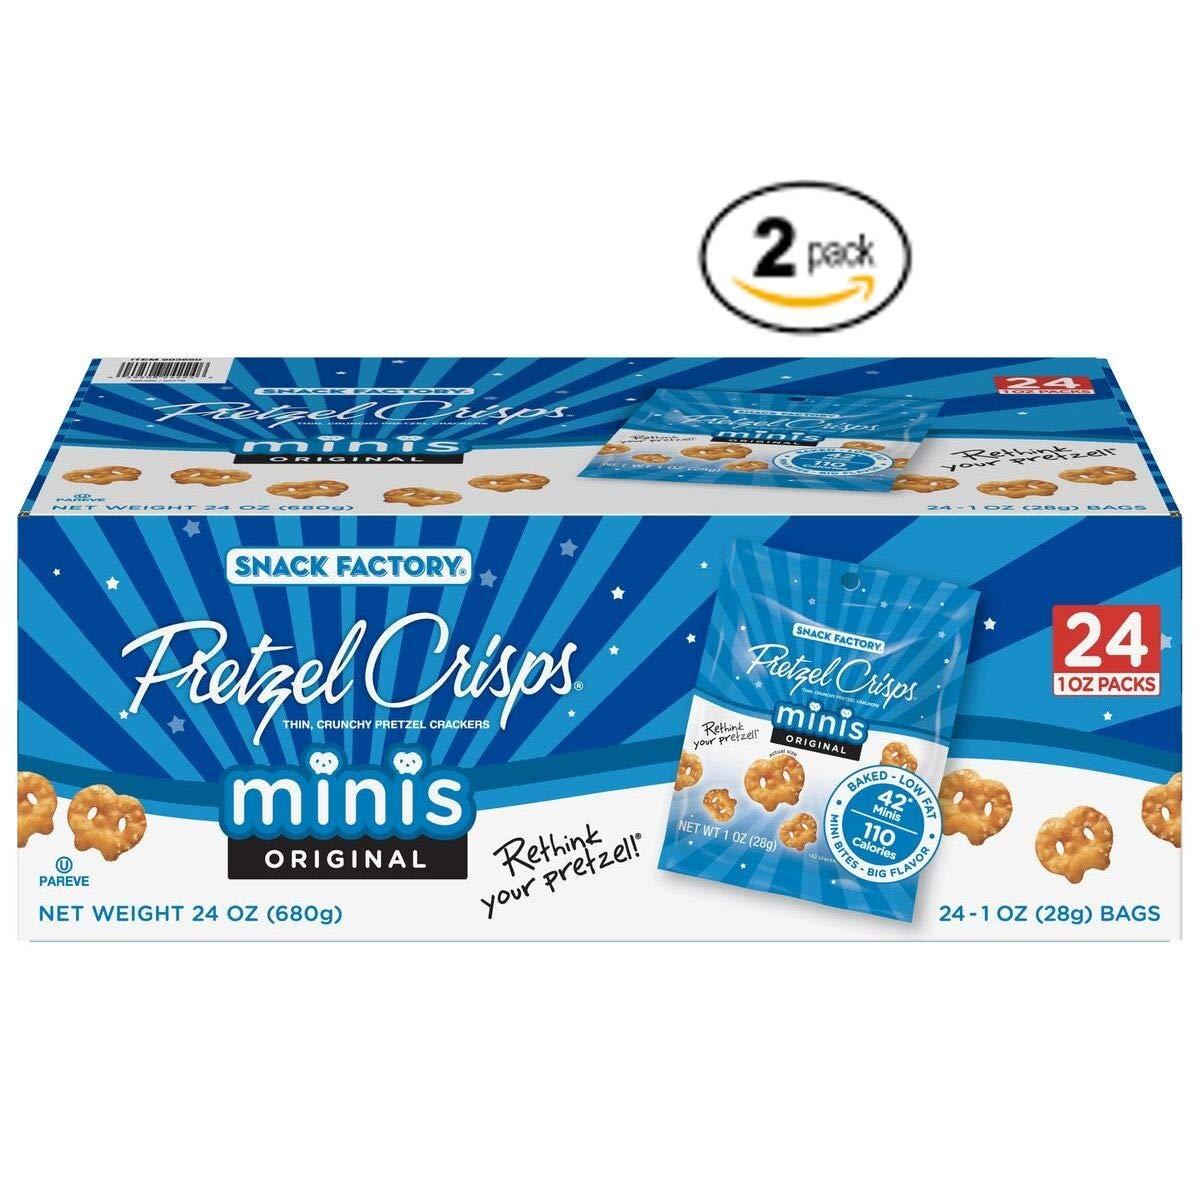 Snack Factory Pretzel Crisps Original Minis, Single-Serve 1 Oz, 24 C (Pack of 2) by Snack Factory